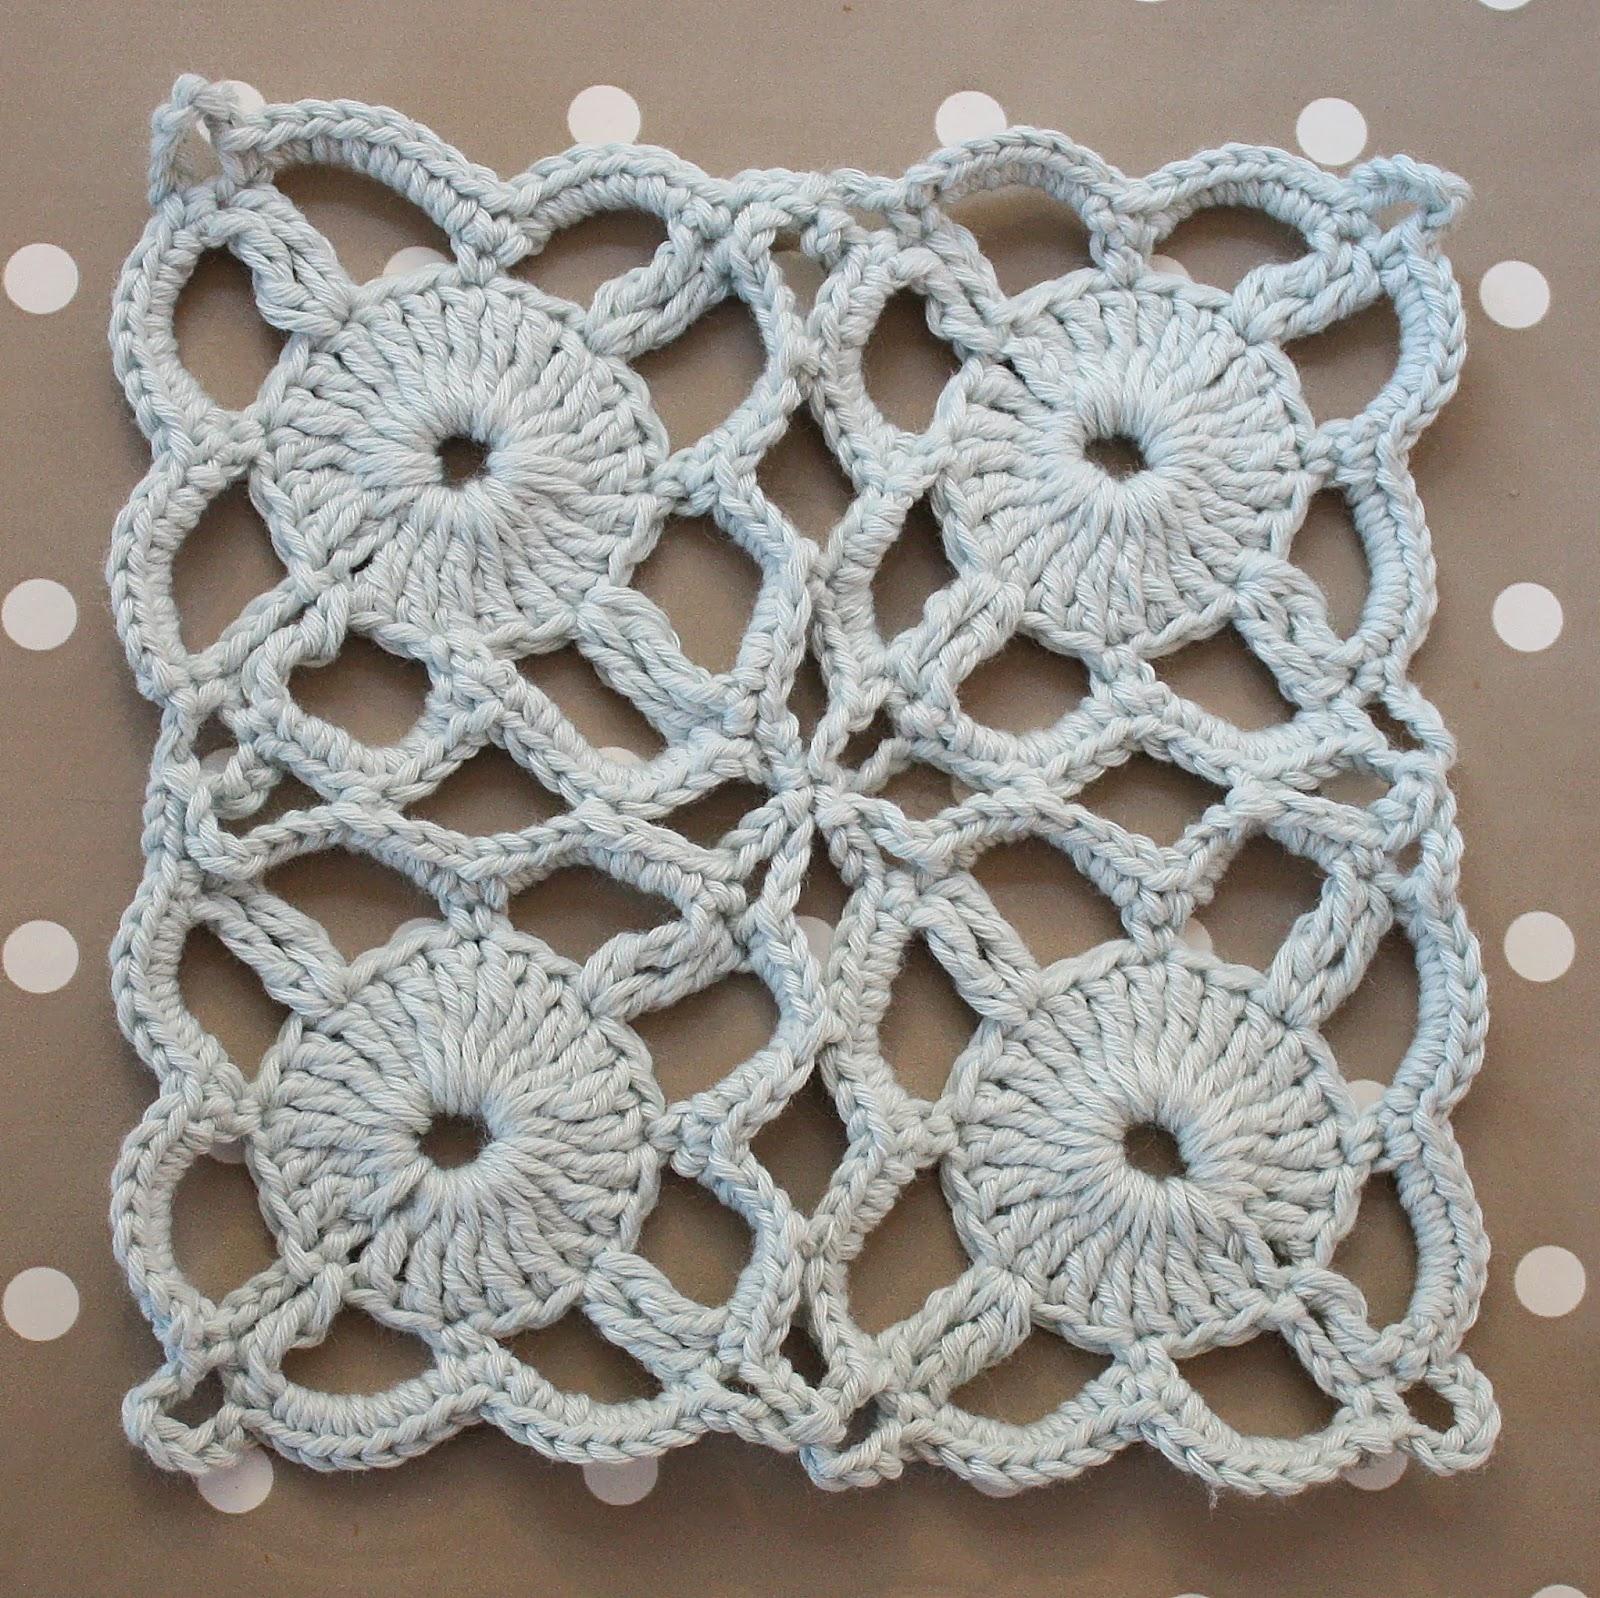 Vintage Crochet Pattern - Dainty Dressing Table Lace | Mezzamay